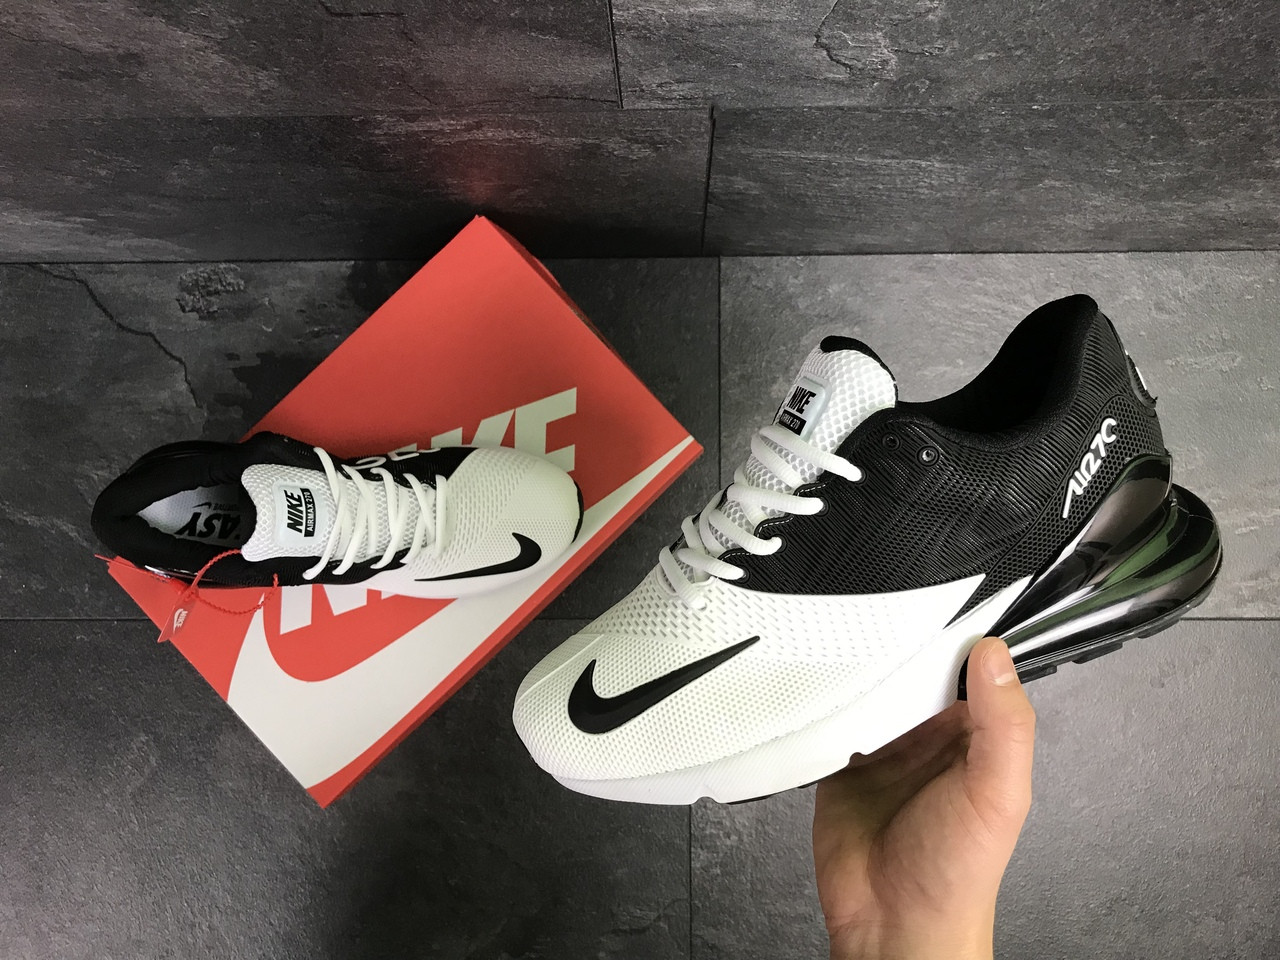 57e165b9 Мужские кроссовки Nike Air Max 270 (Бело-черные) весна-осень, цена 1 ...